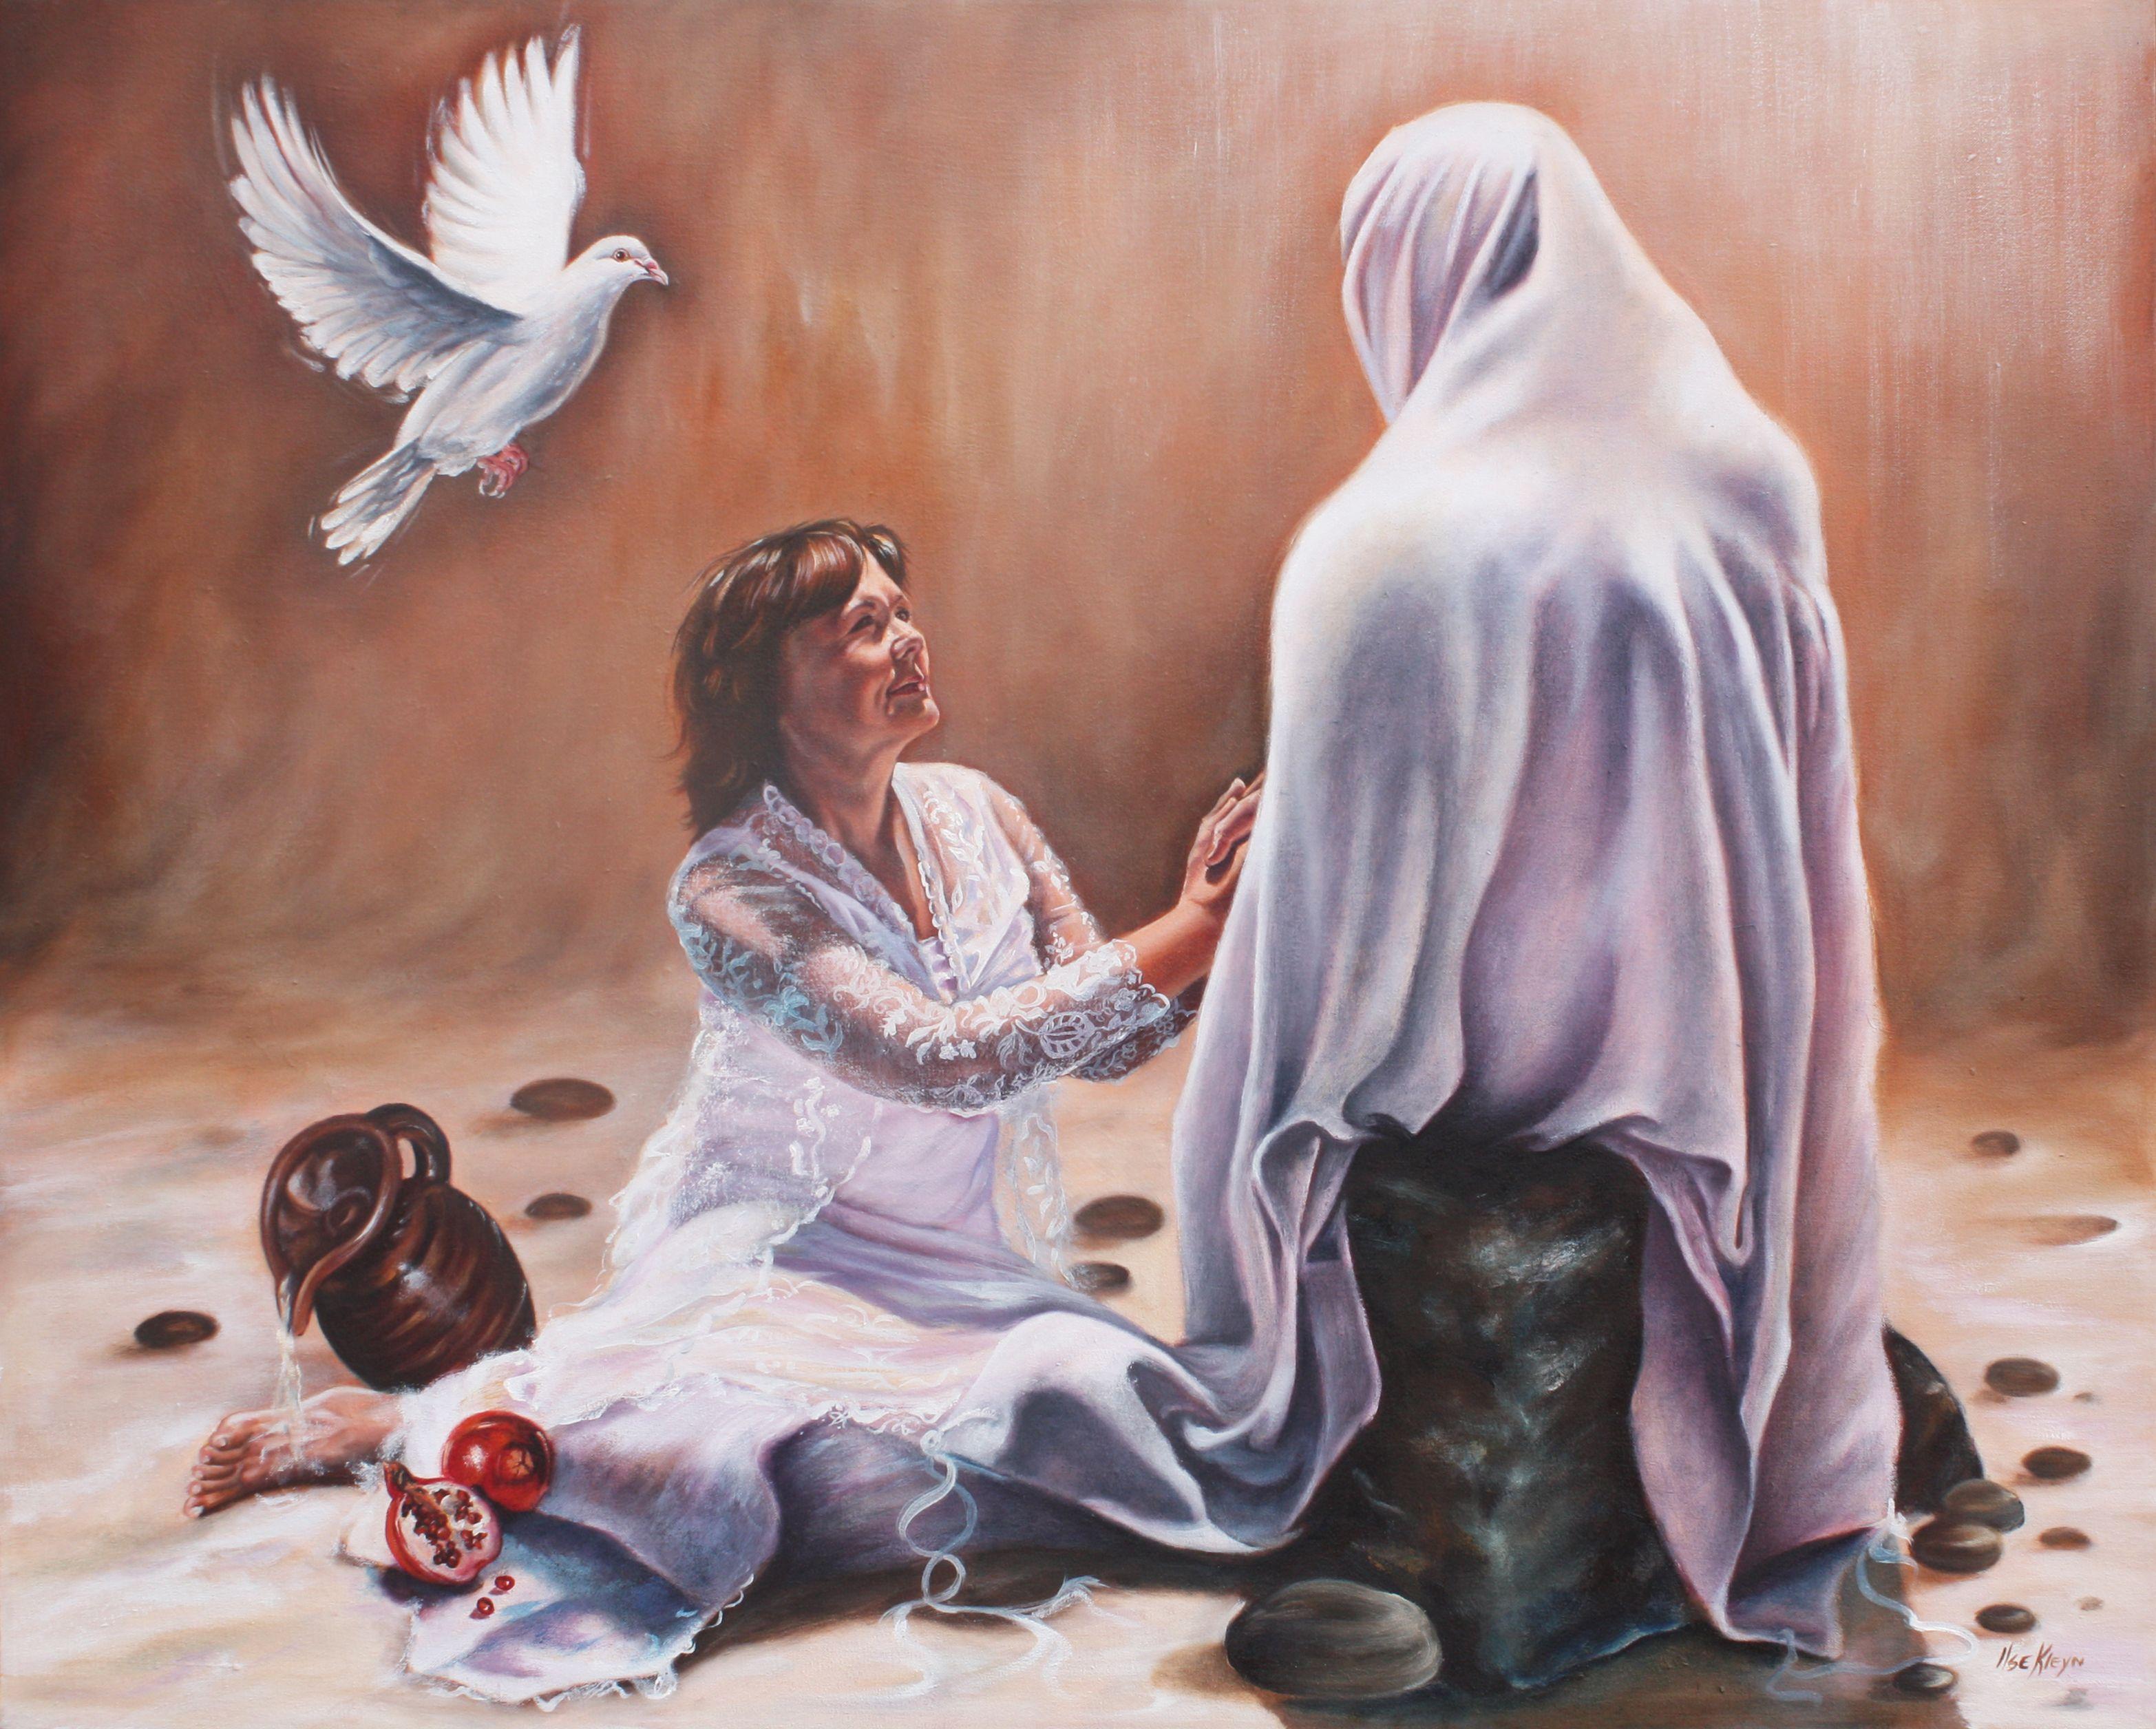 Sitting at the feet of my  Bridegroom. Oil on canvas by Ilse KLeyn. www.artofkleyn.com | Holy spirit art, Prophetic art, Christian art